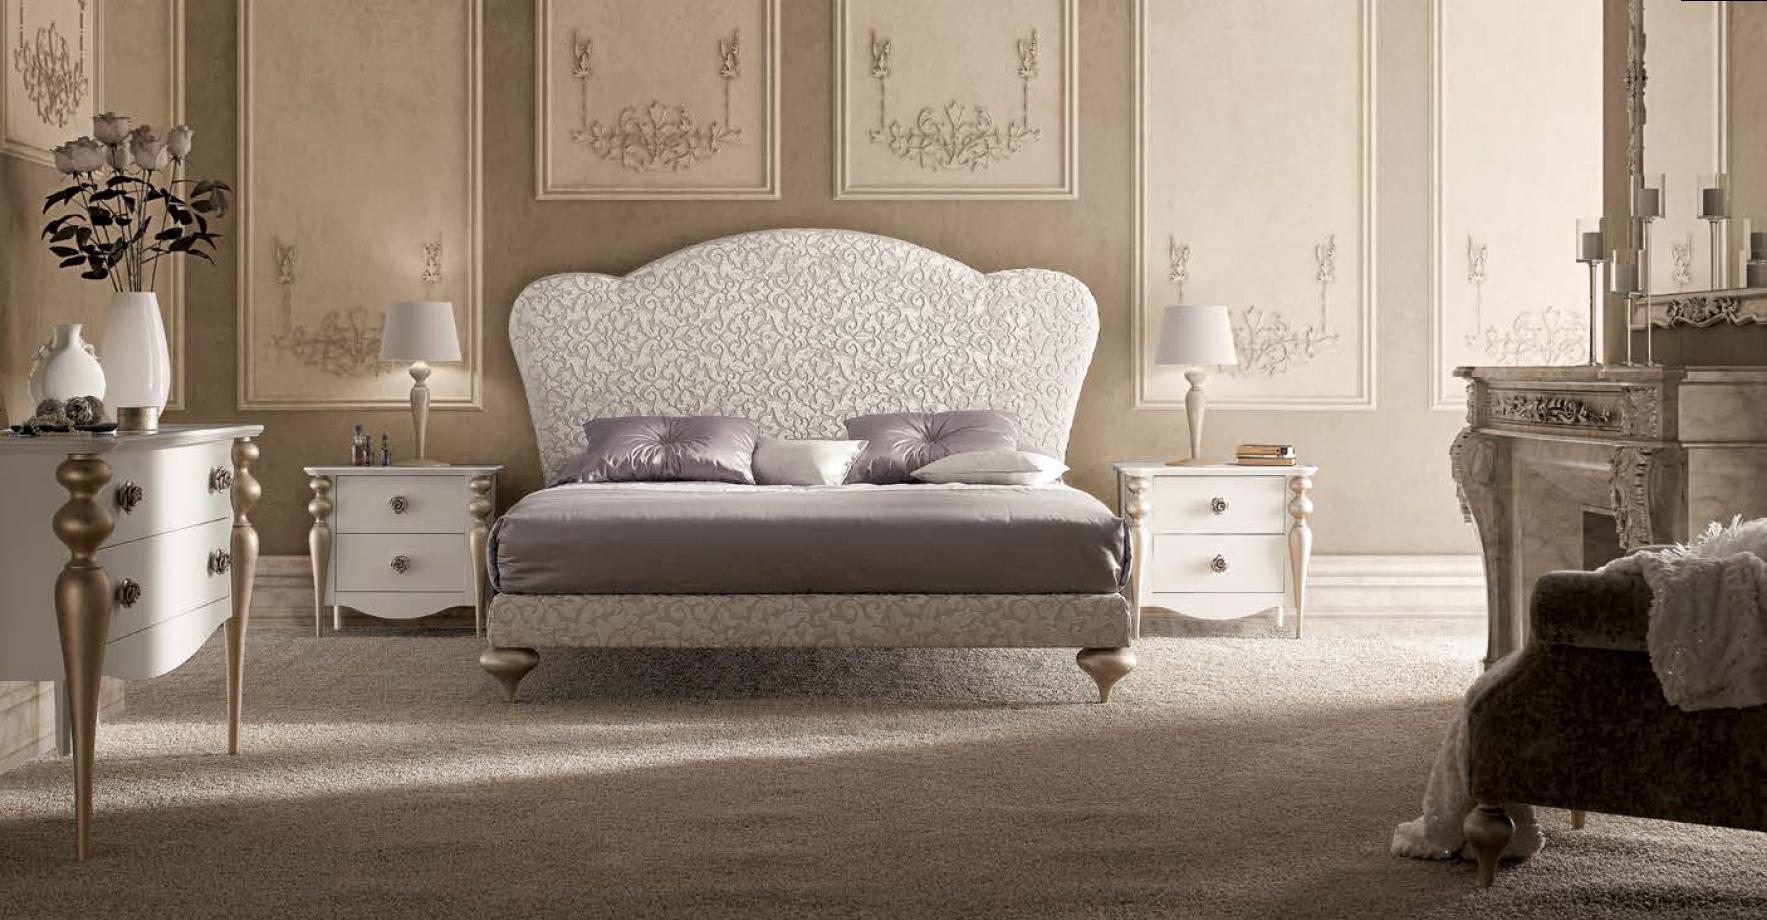 dormitorios de matrimonio de estilo clasico (62)